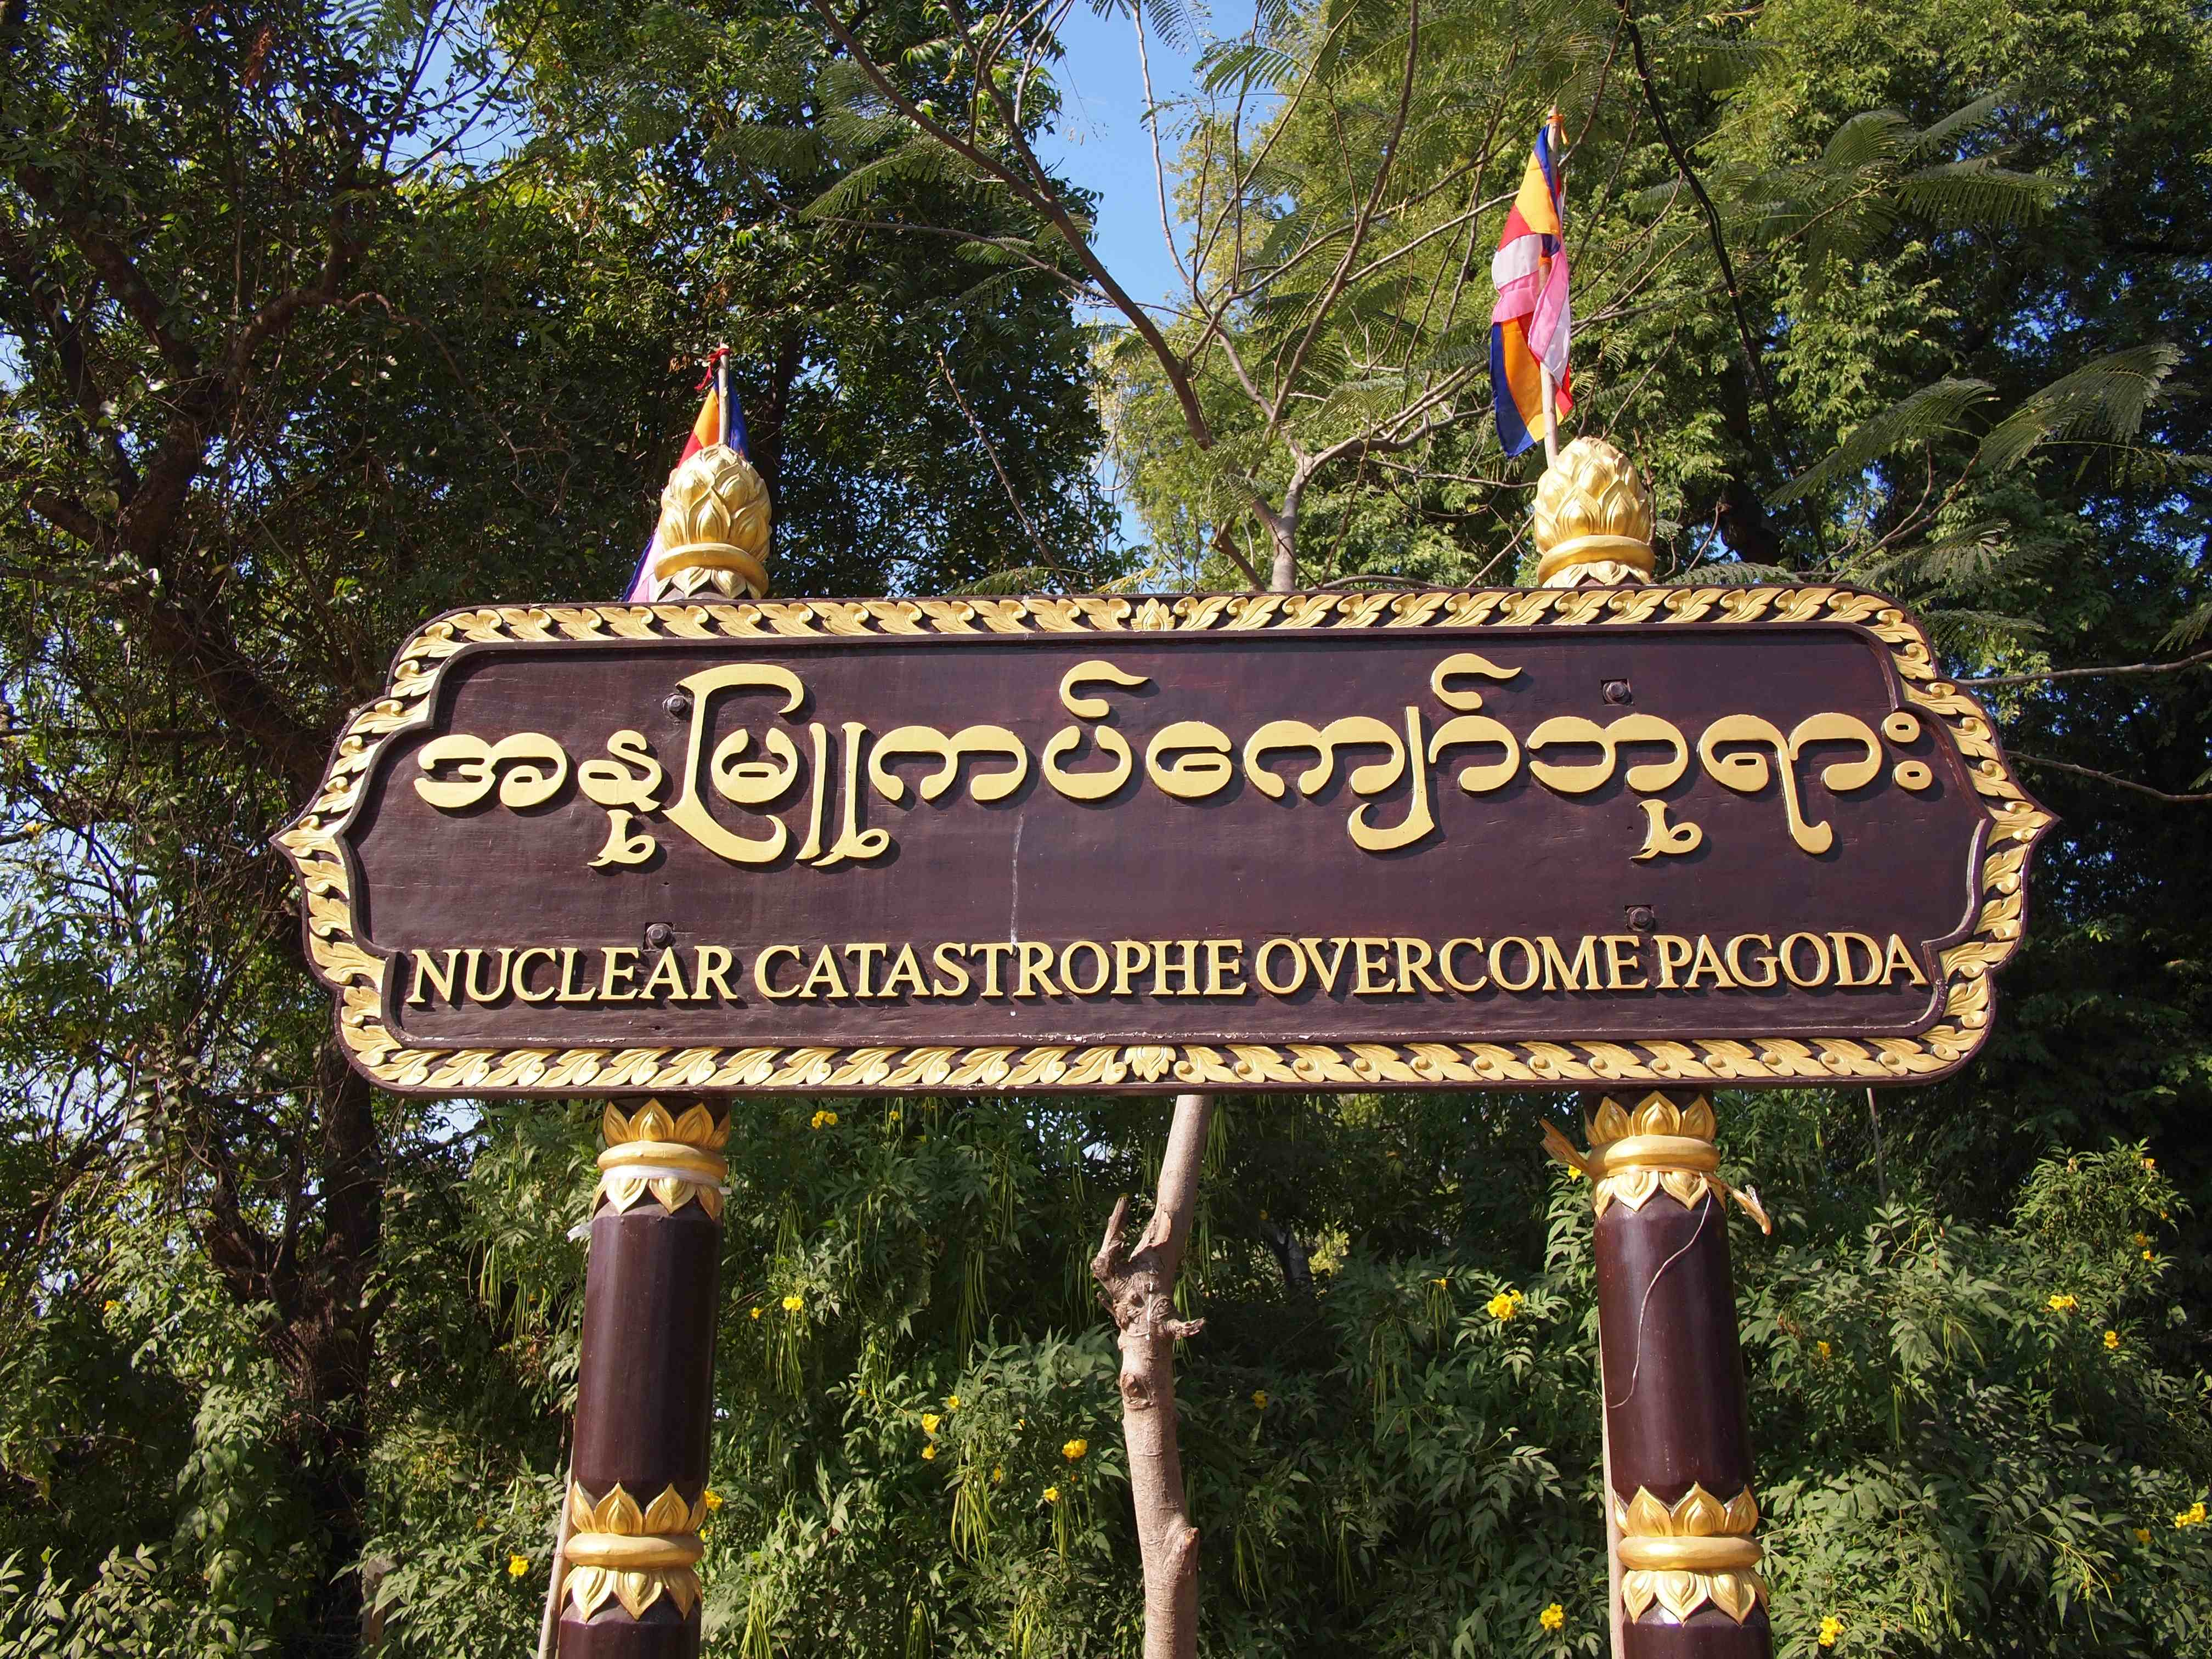 Nuclear Catastrophe Overcome Pagoda